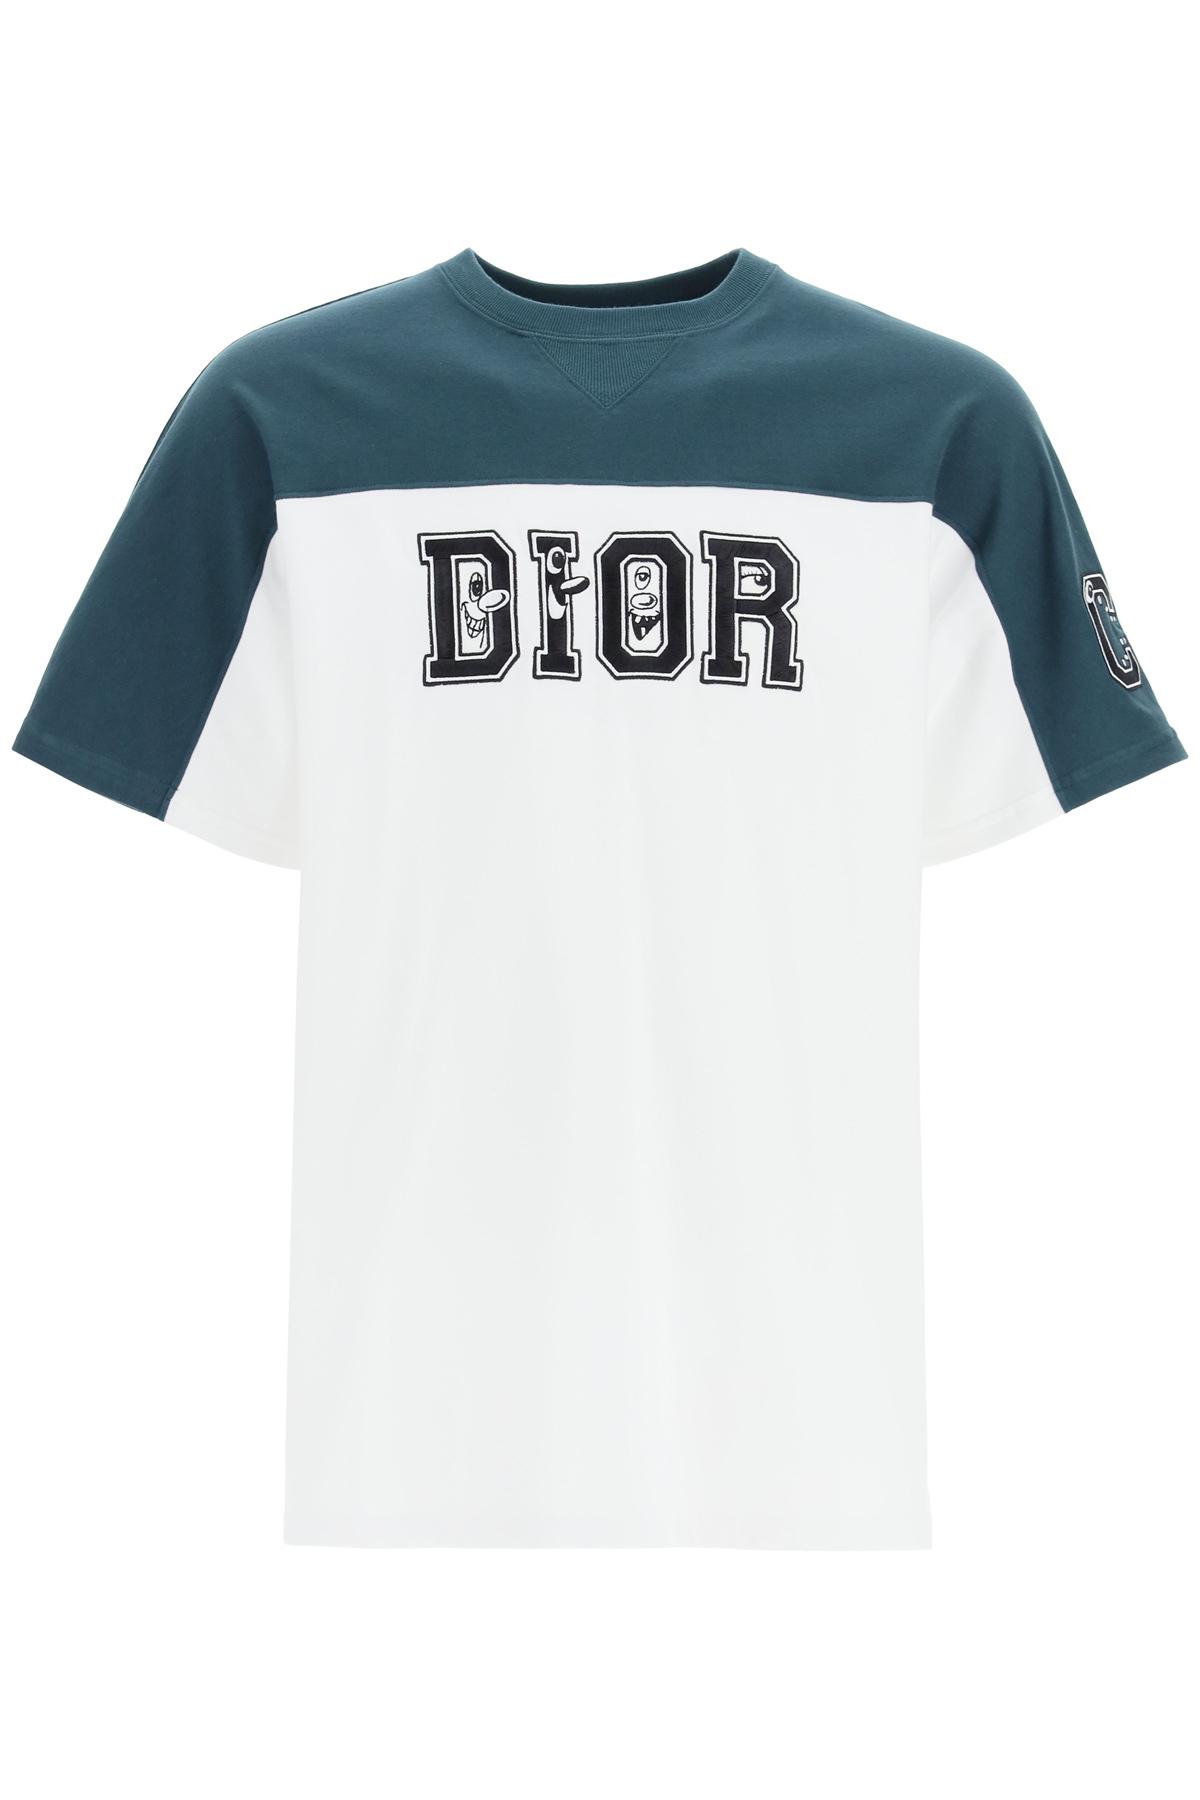 Dior t-shirt maxi logo